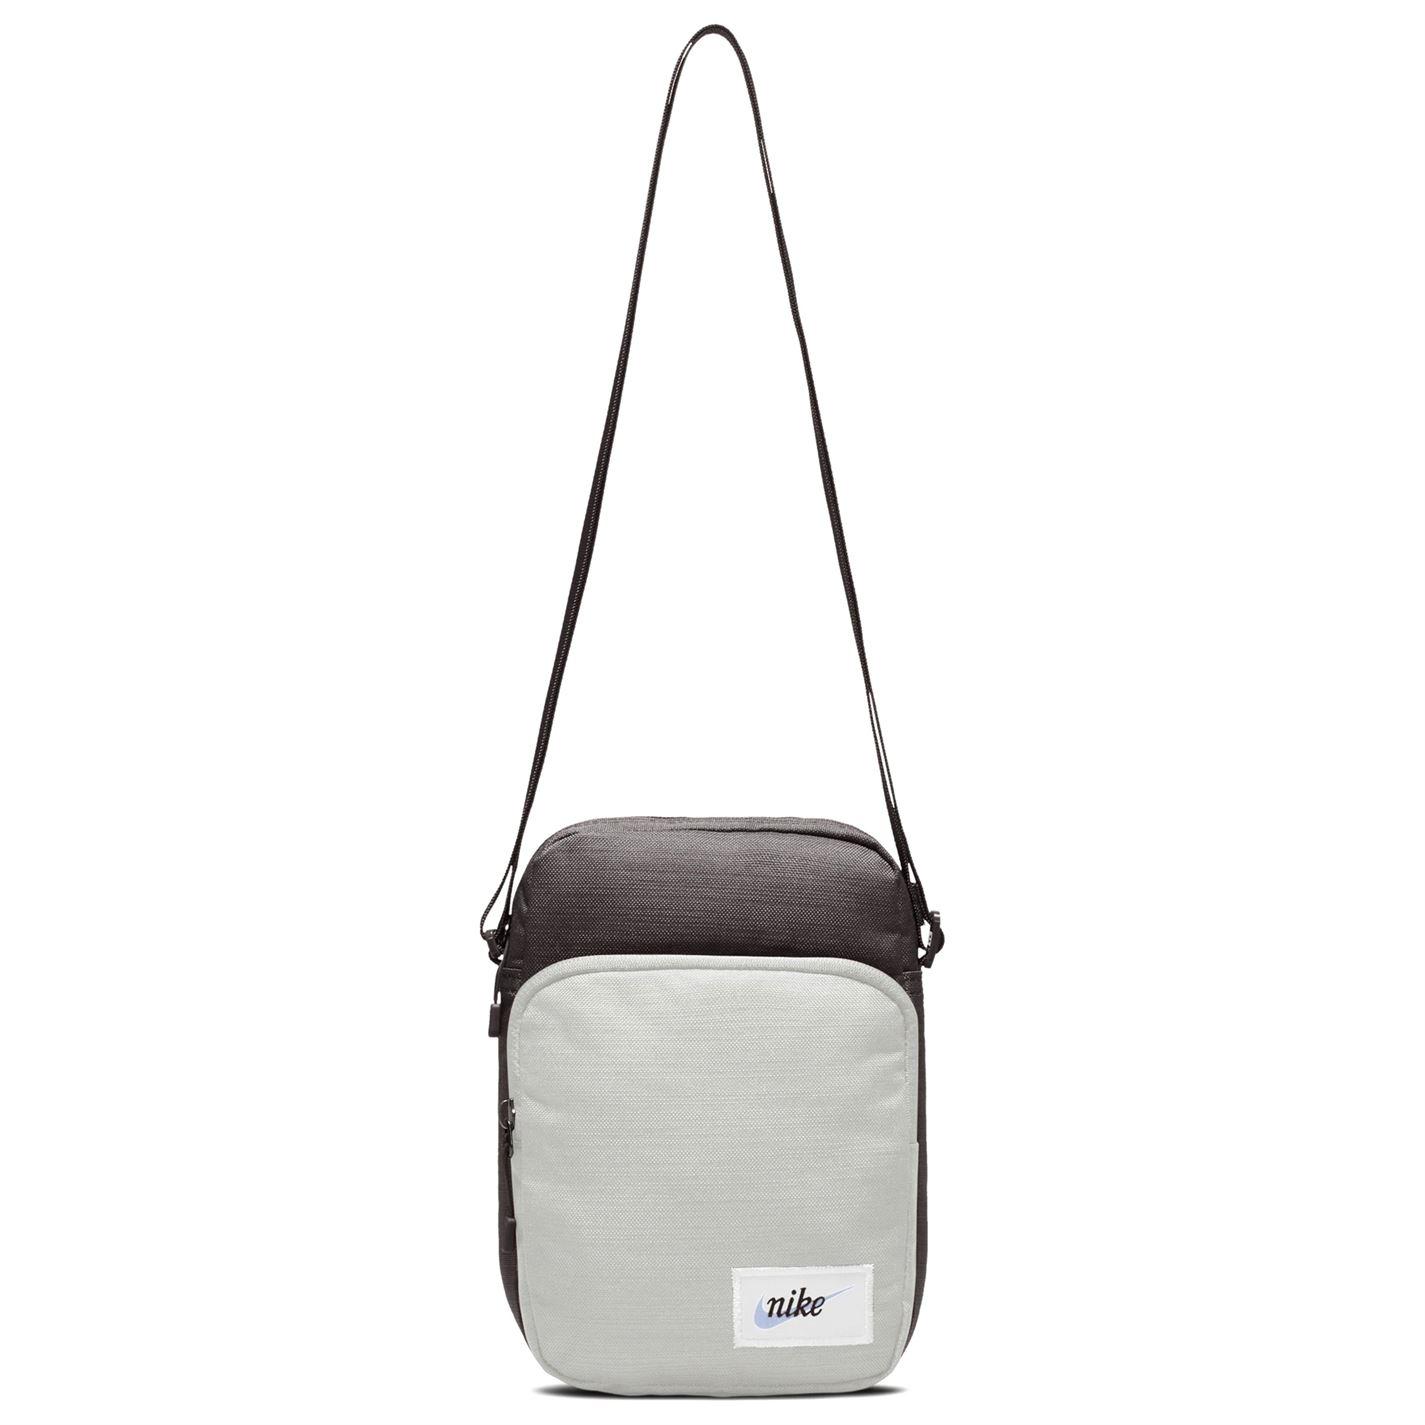 6d803f711 Nike Small Items Bag Grey - Glami.cz